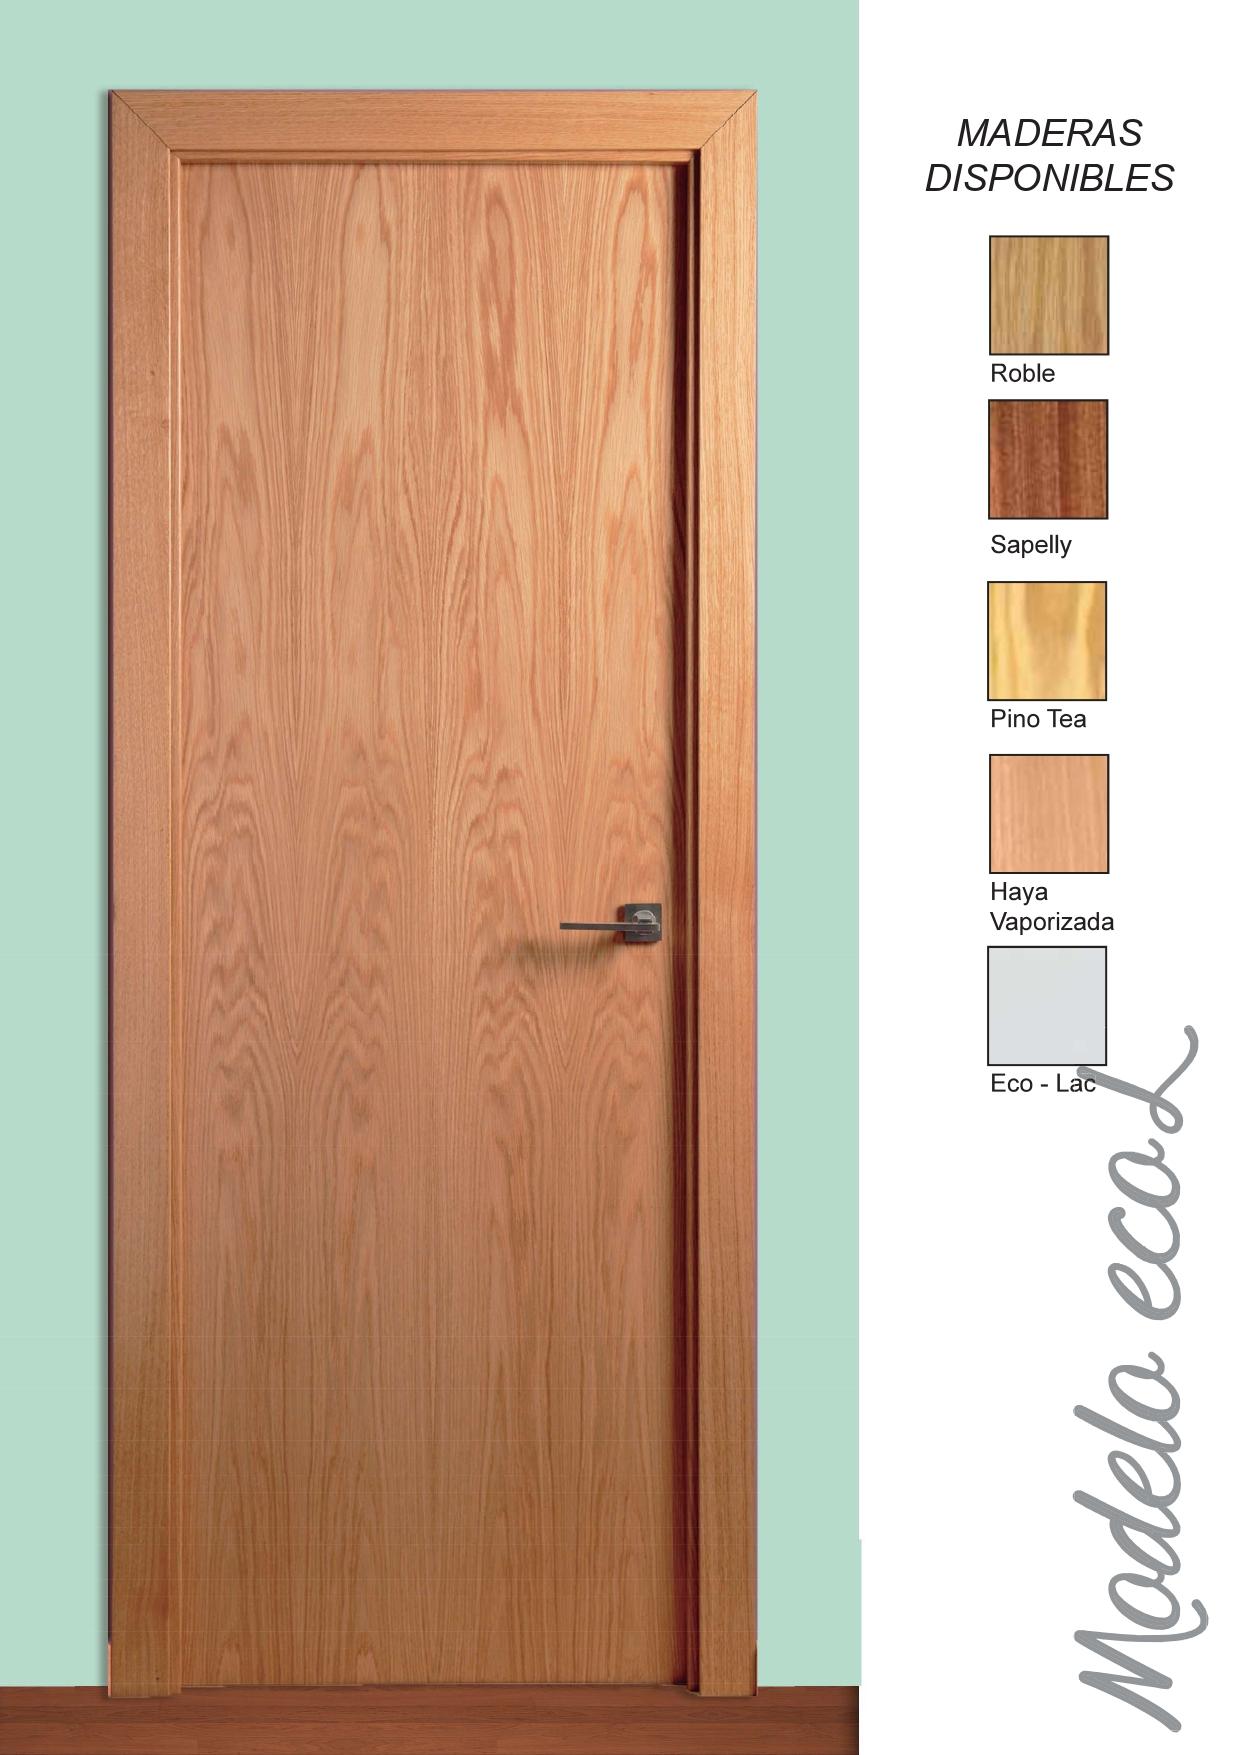 Puerta Modelo EcoL